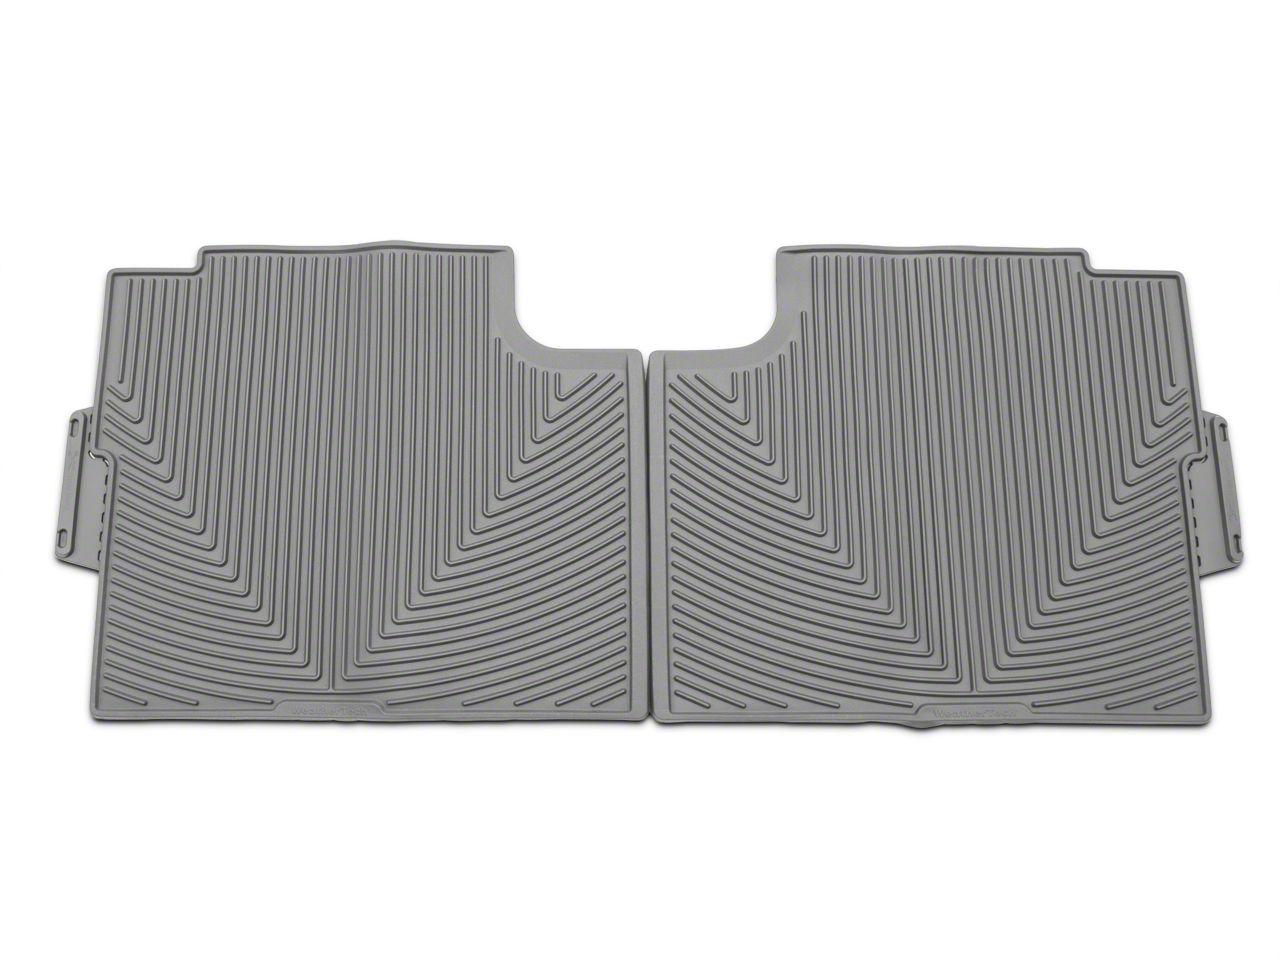 Weathertech All Weather Rear Rubber Floor Mats - Gray (15-19 F-150 SuperCrew)